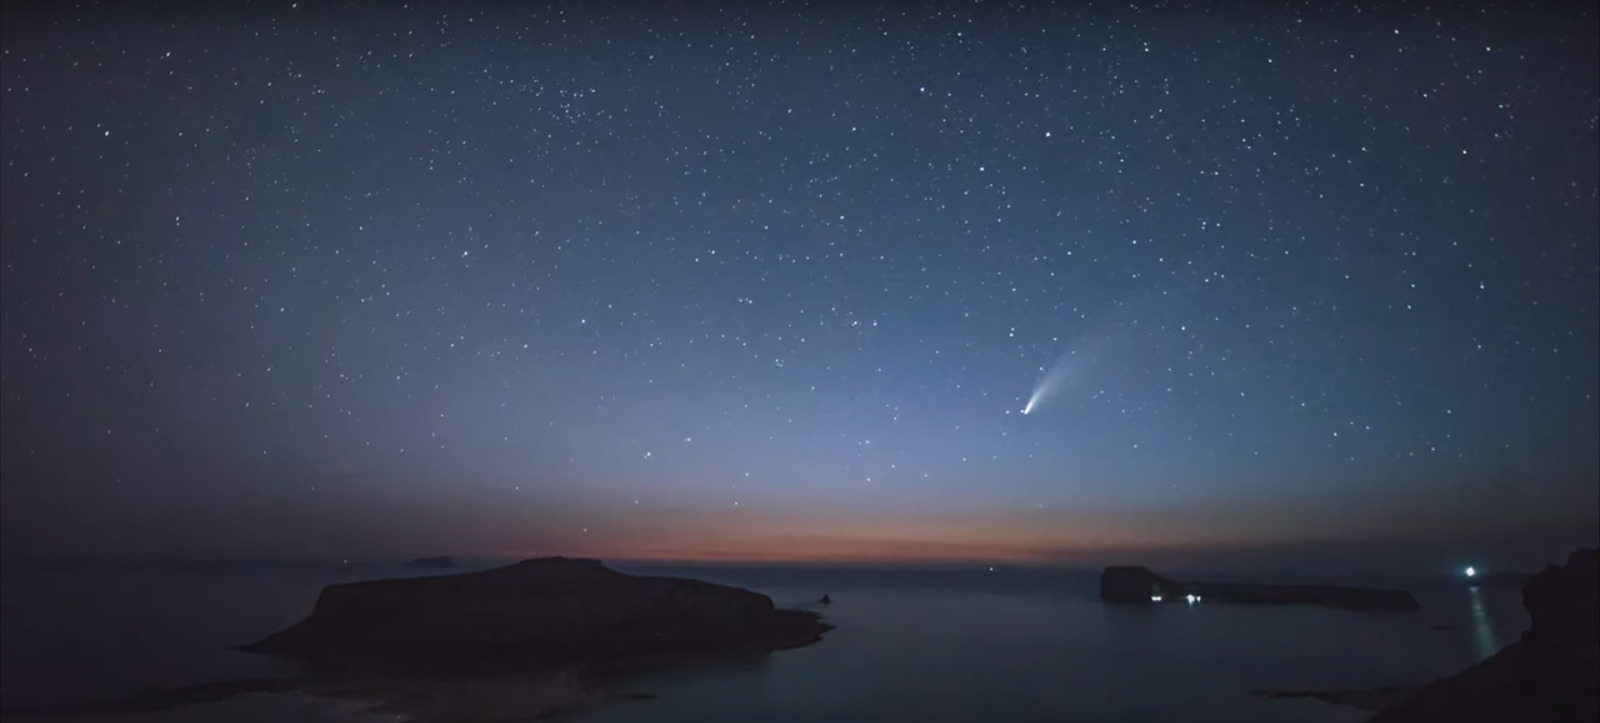 Kομήτης περνάει πάνω από τον ονειρεμένο Μπάλο στην Κίσαμο